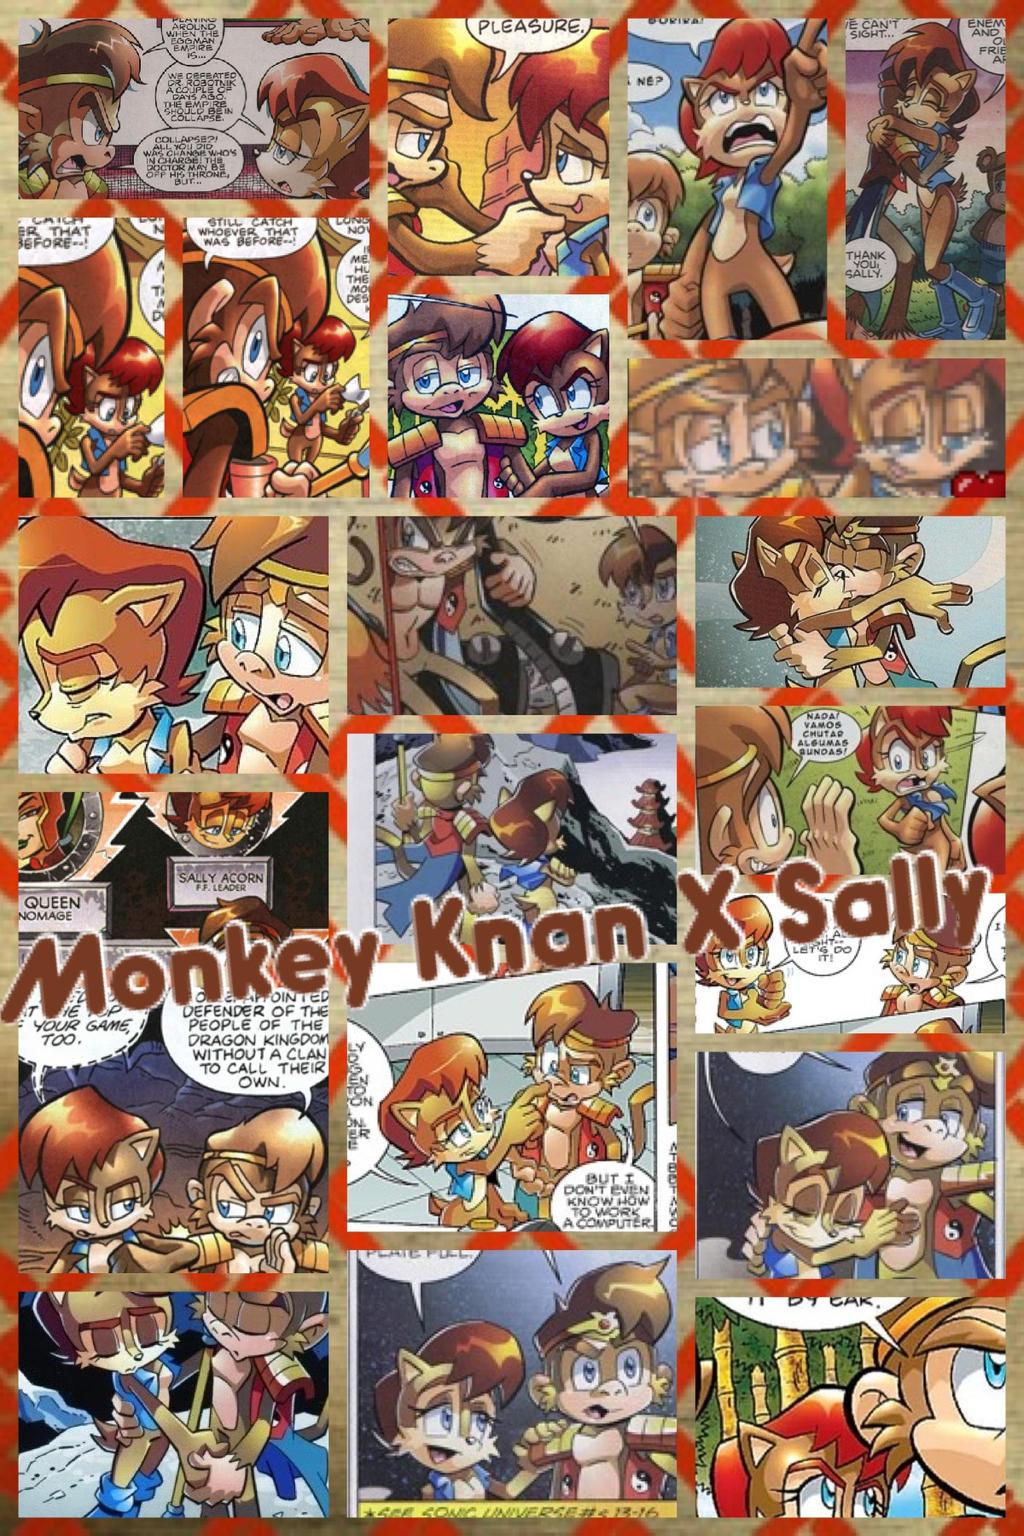 monkey khan x sally by princessemerald7 on deviantart